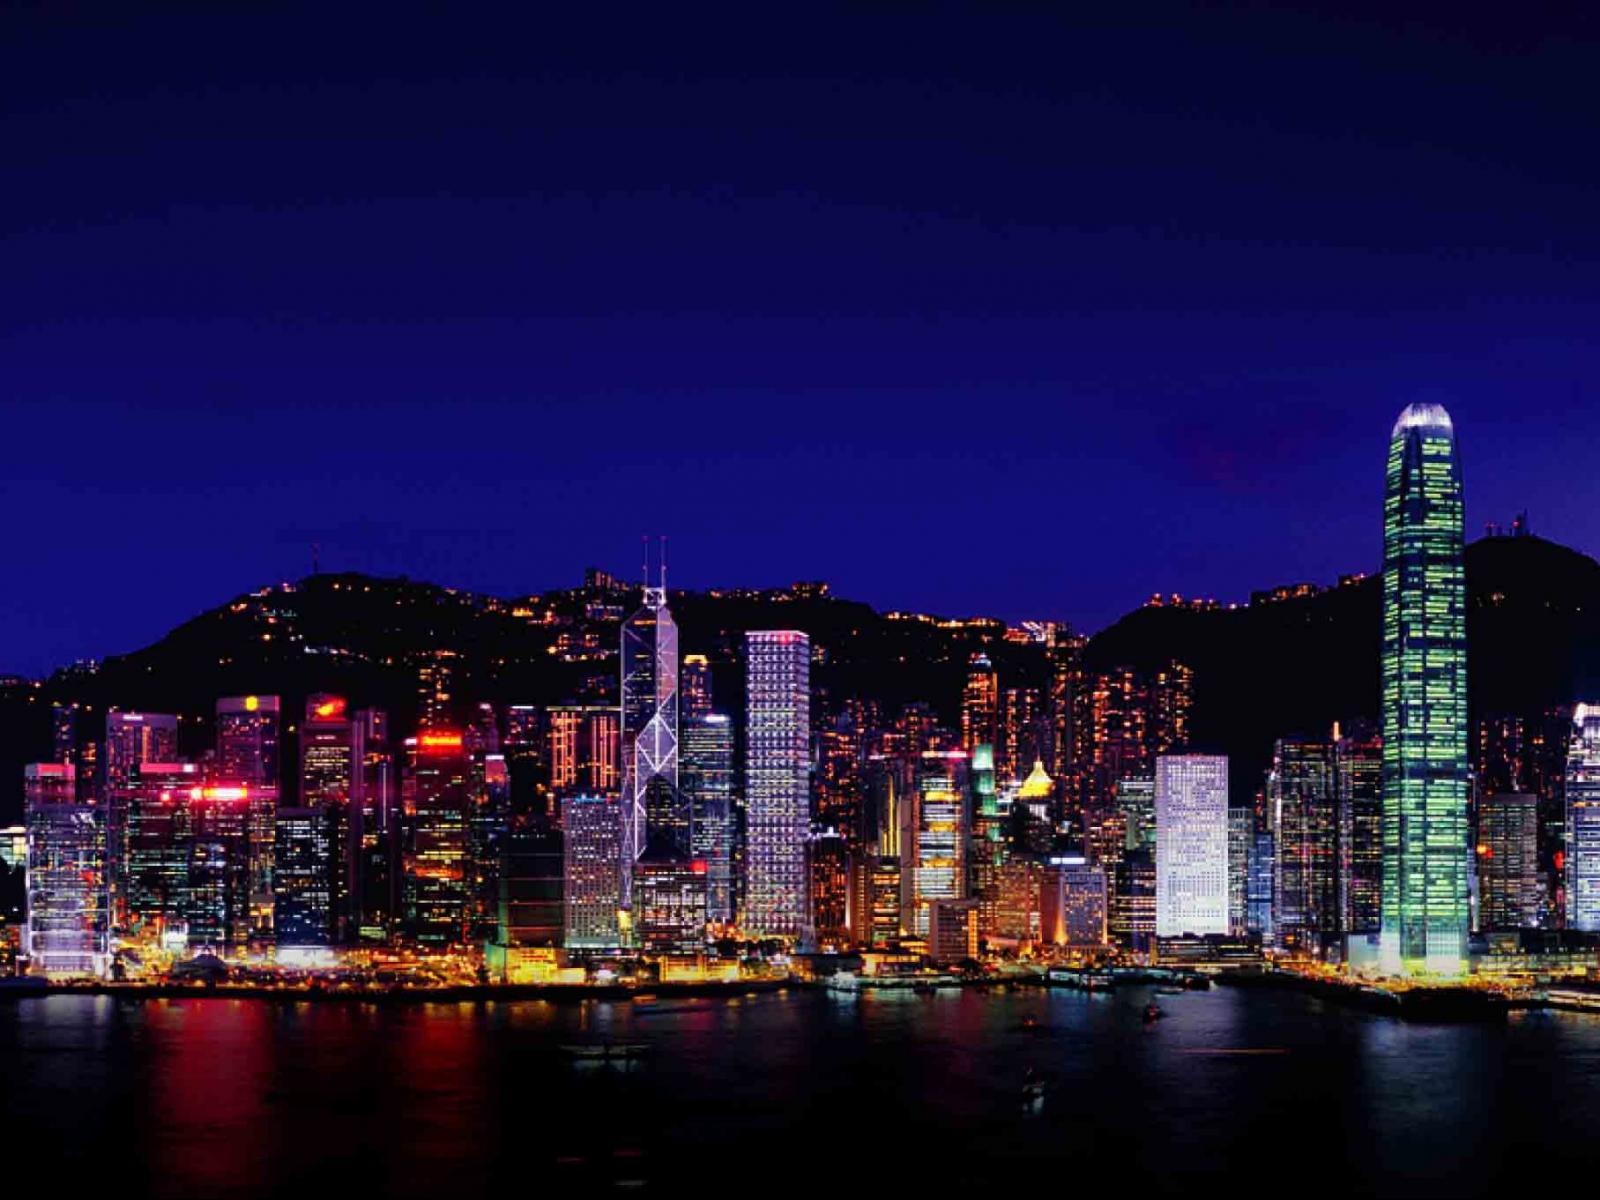 1200x1600 Wallpaper Hd: Pic New Posts: Hd Wallpaper Hong Kong